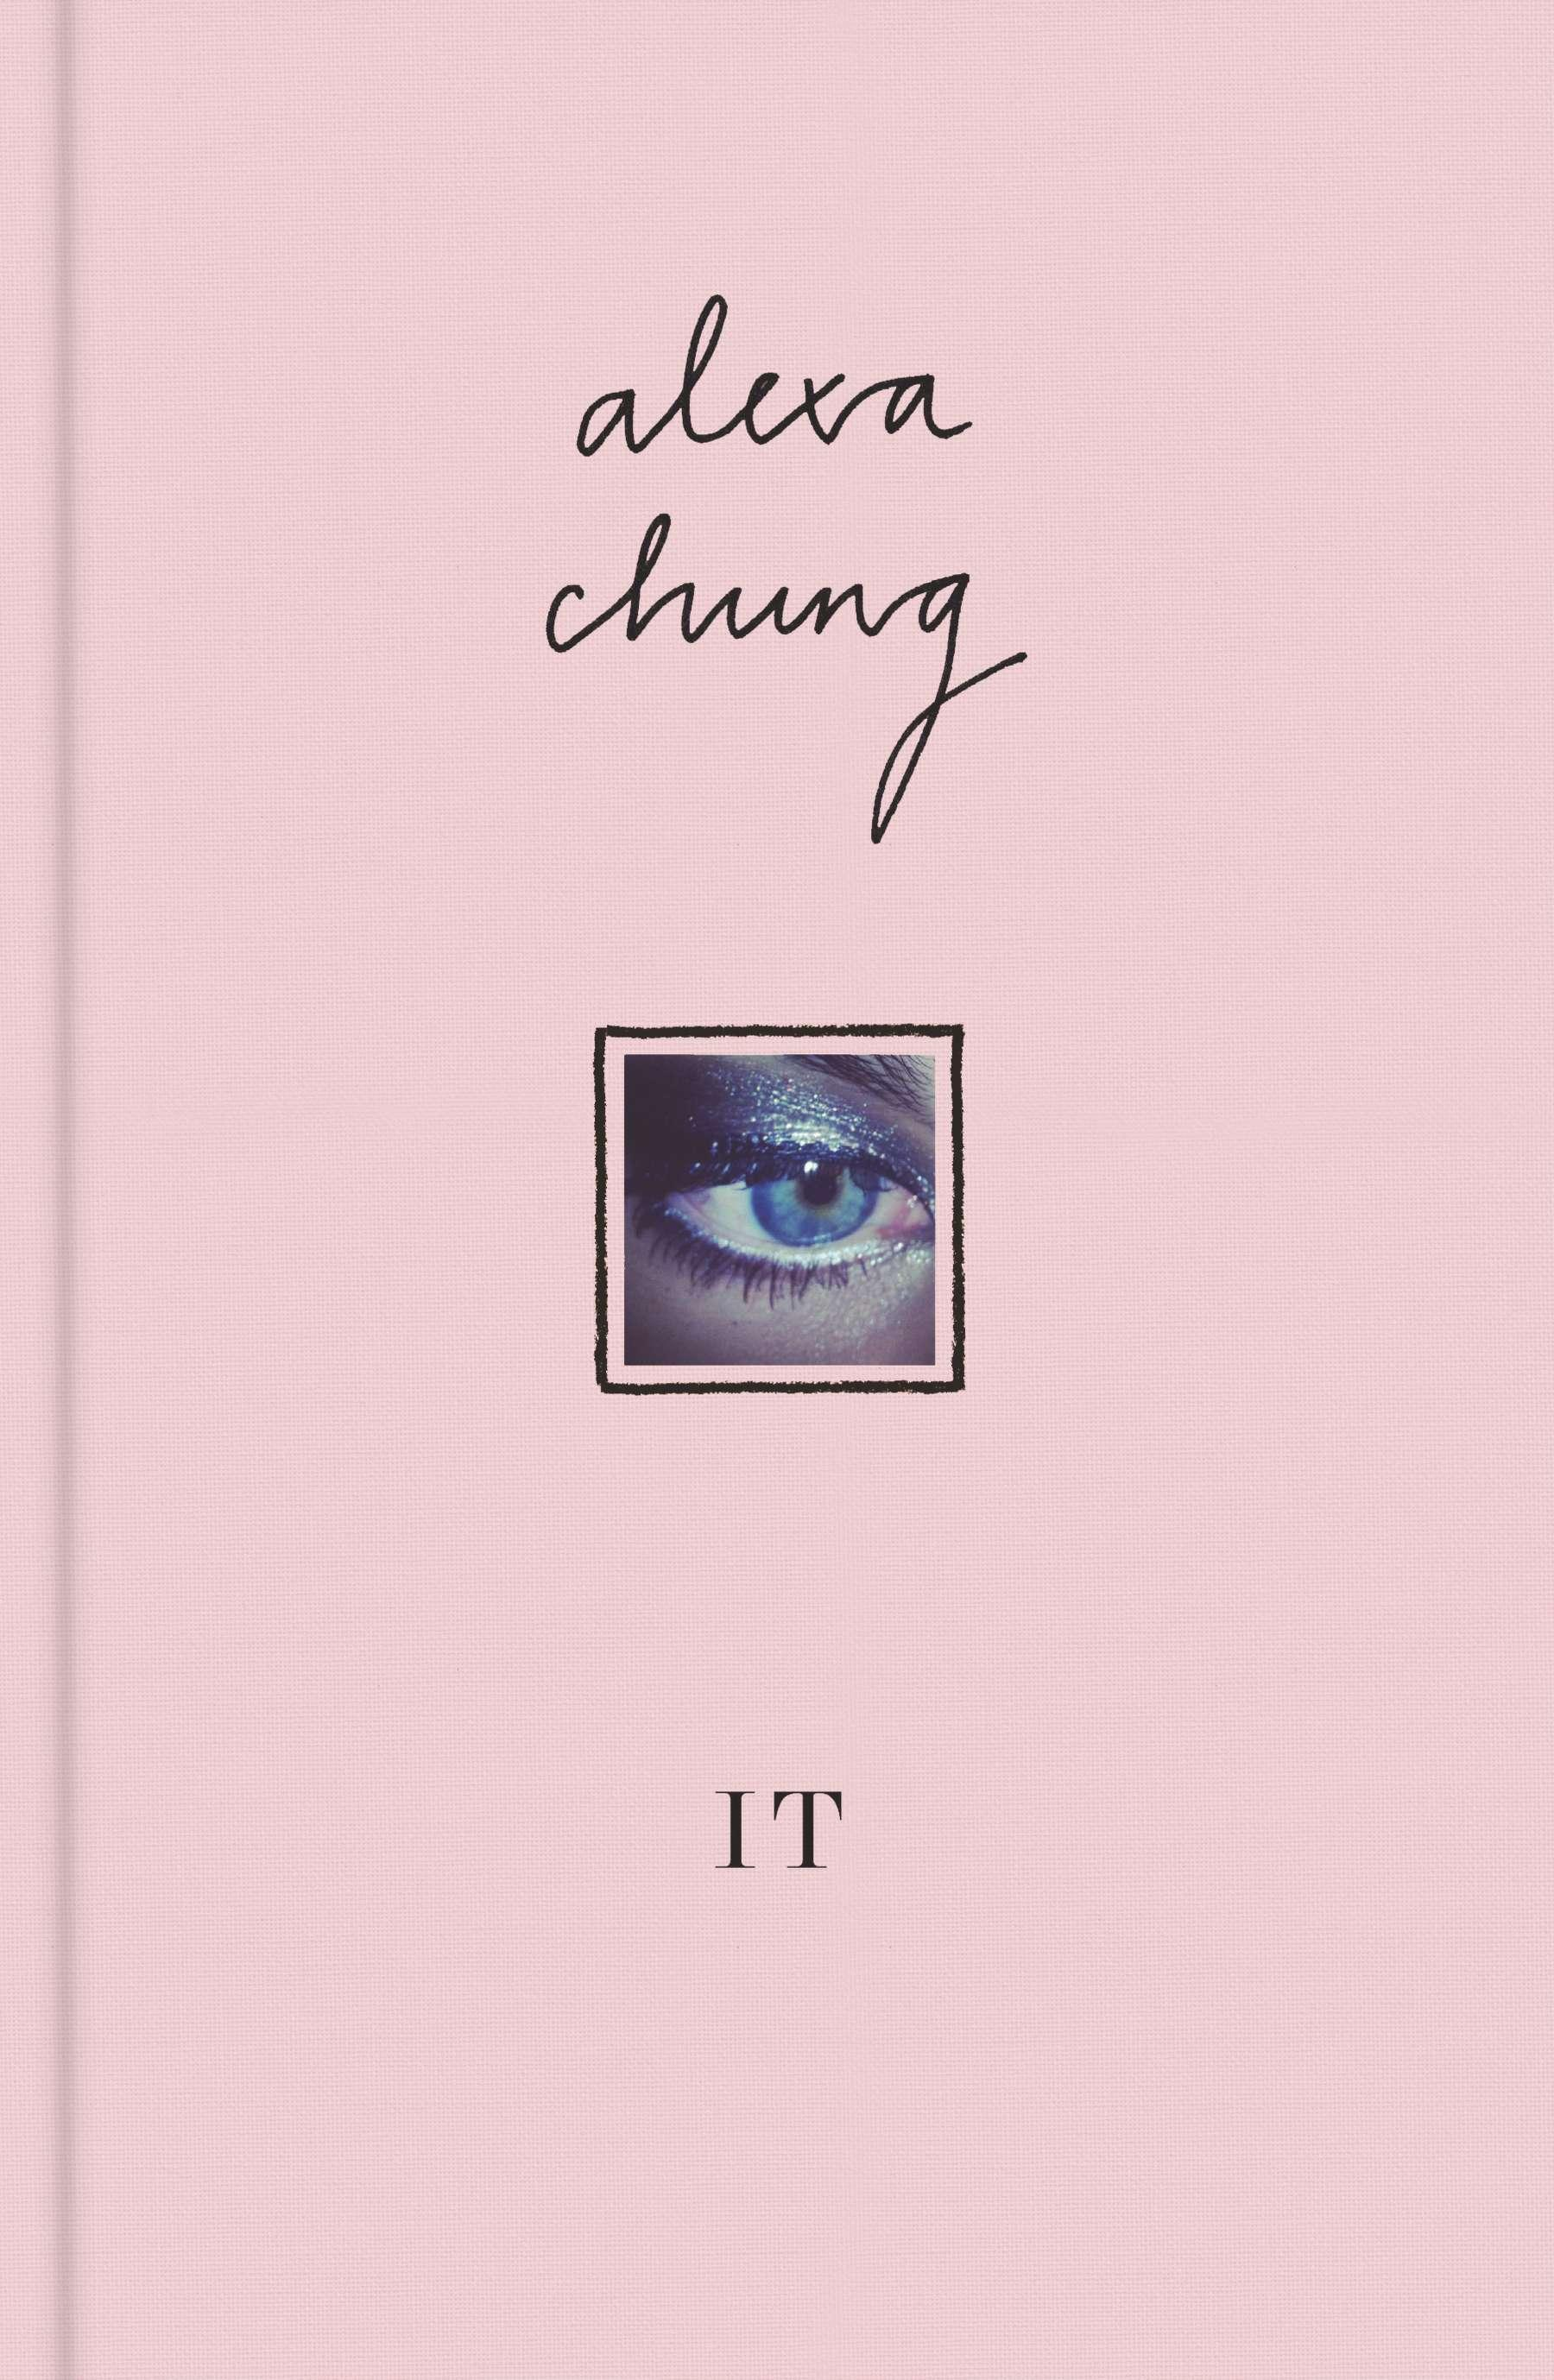 Book Launch: It by Alexa Chung, with Piera Gelardi from Refinery 29